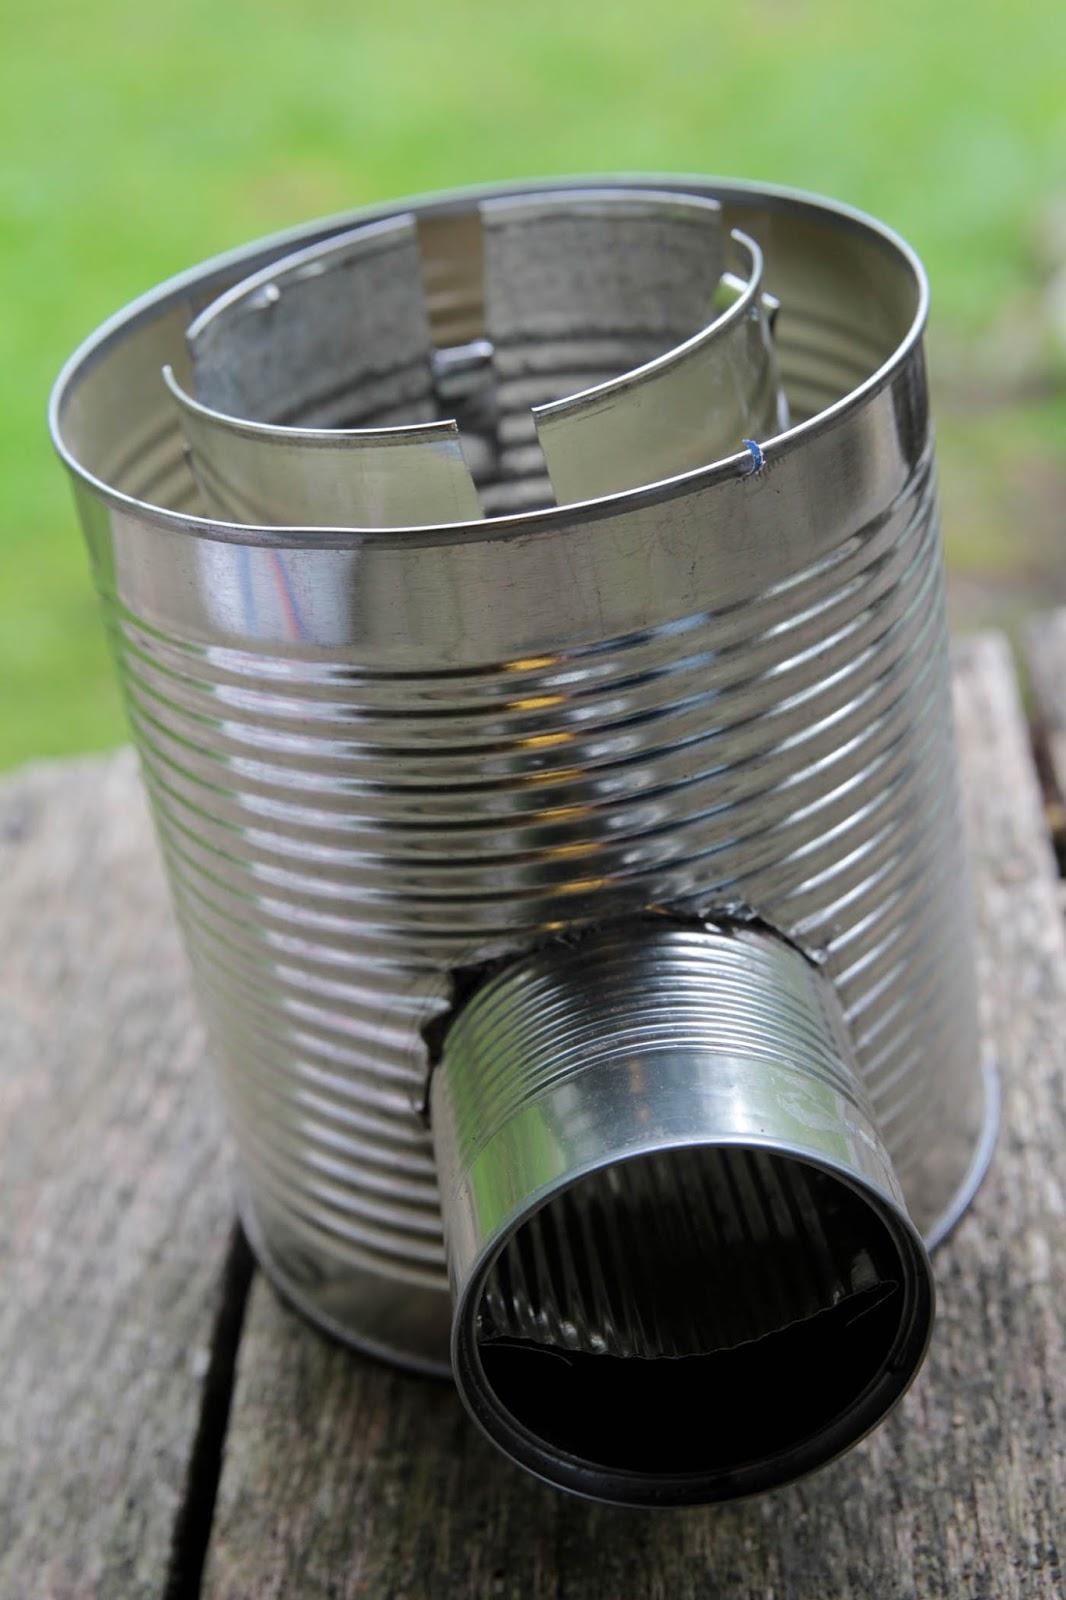 Farmington ut west stake provident living rocket stoves for Make a rocket stove